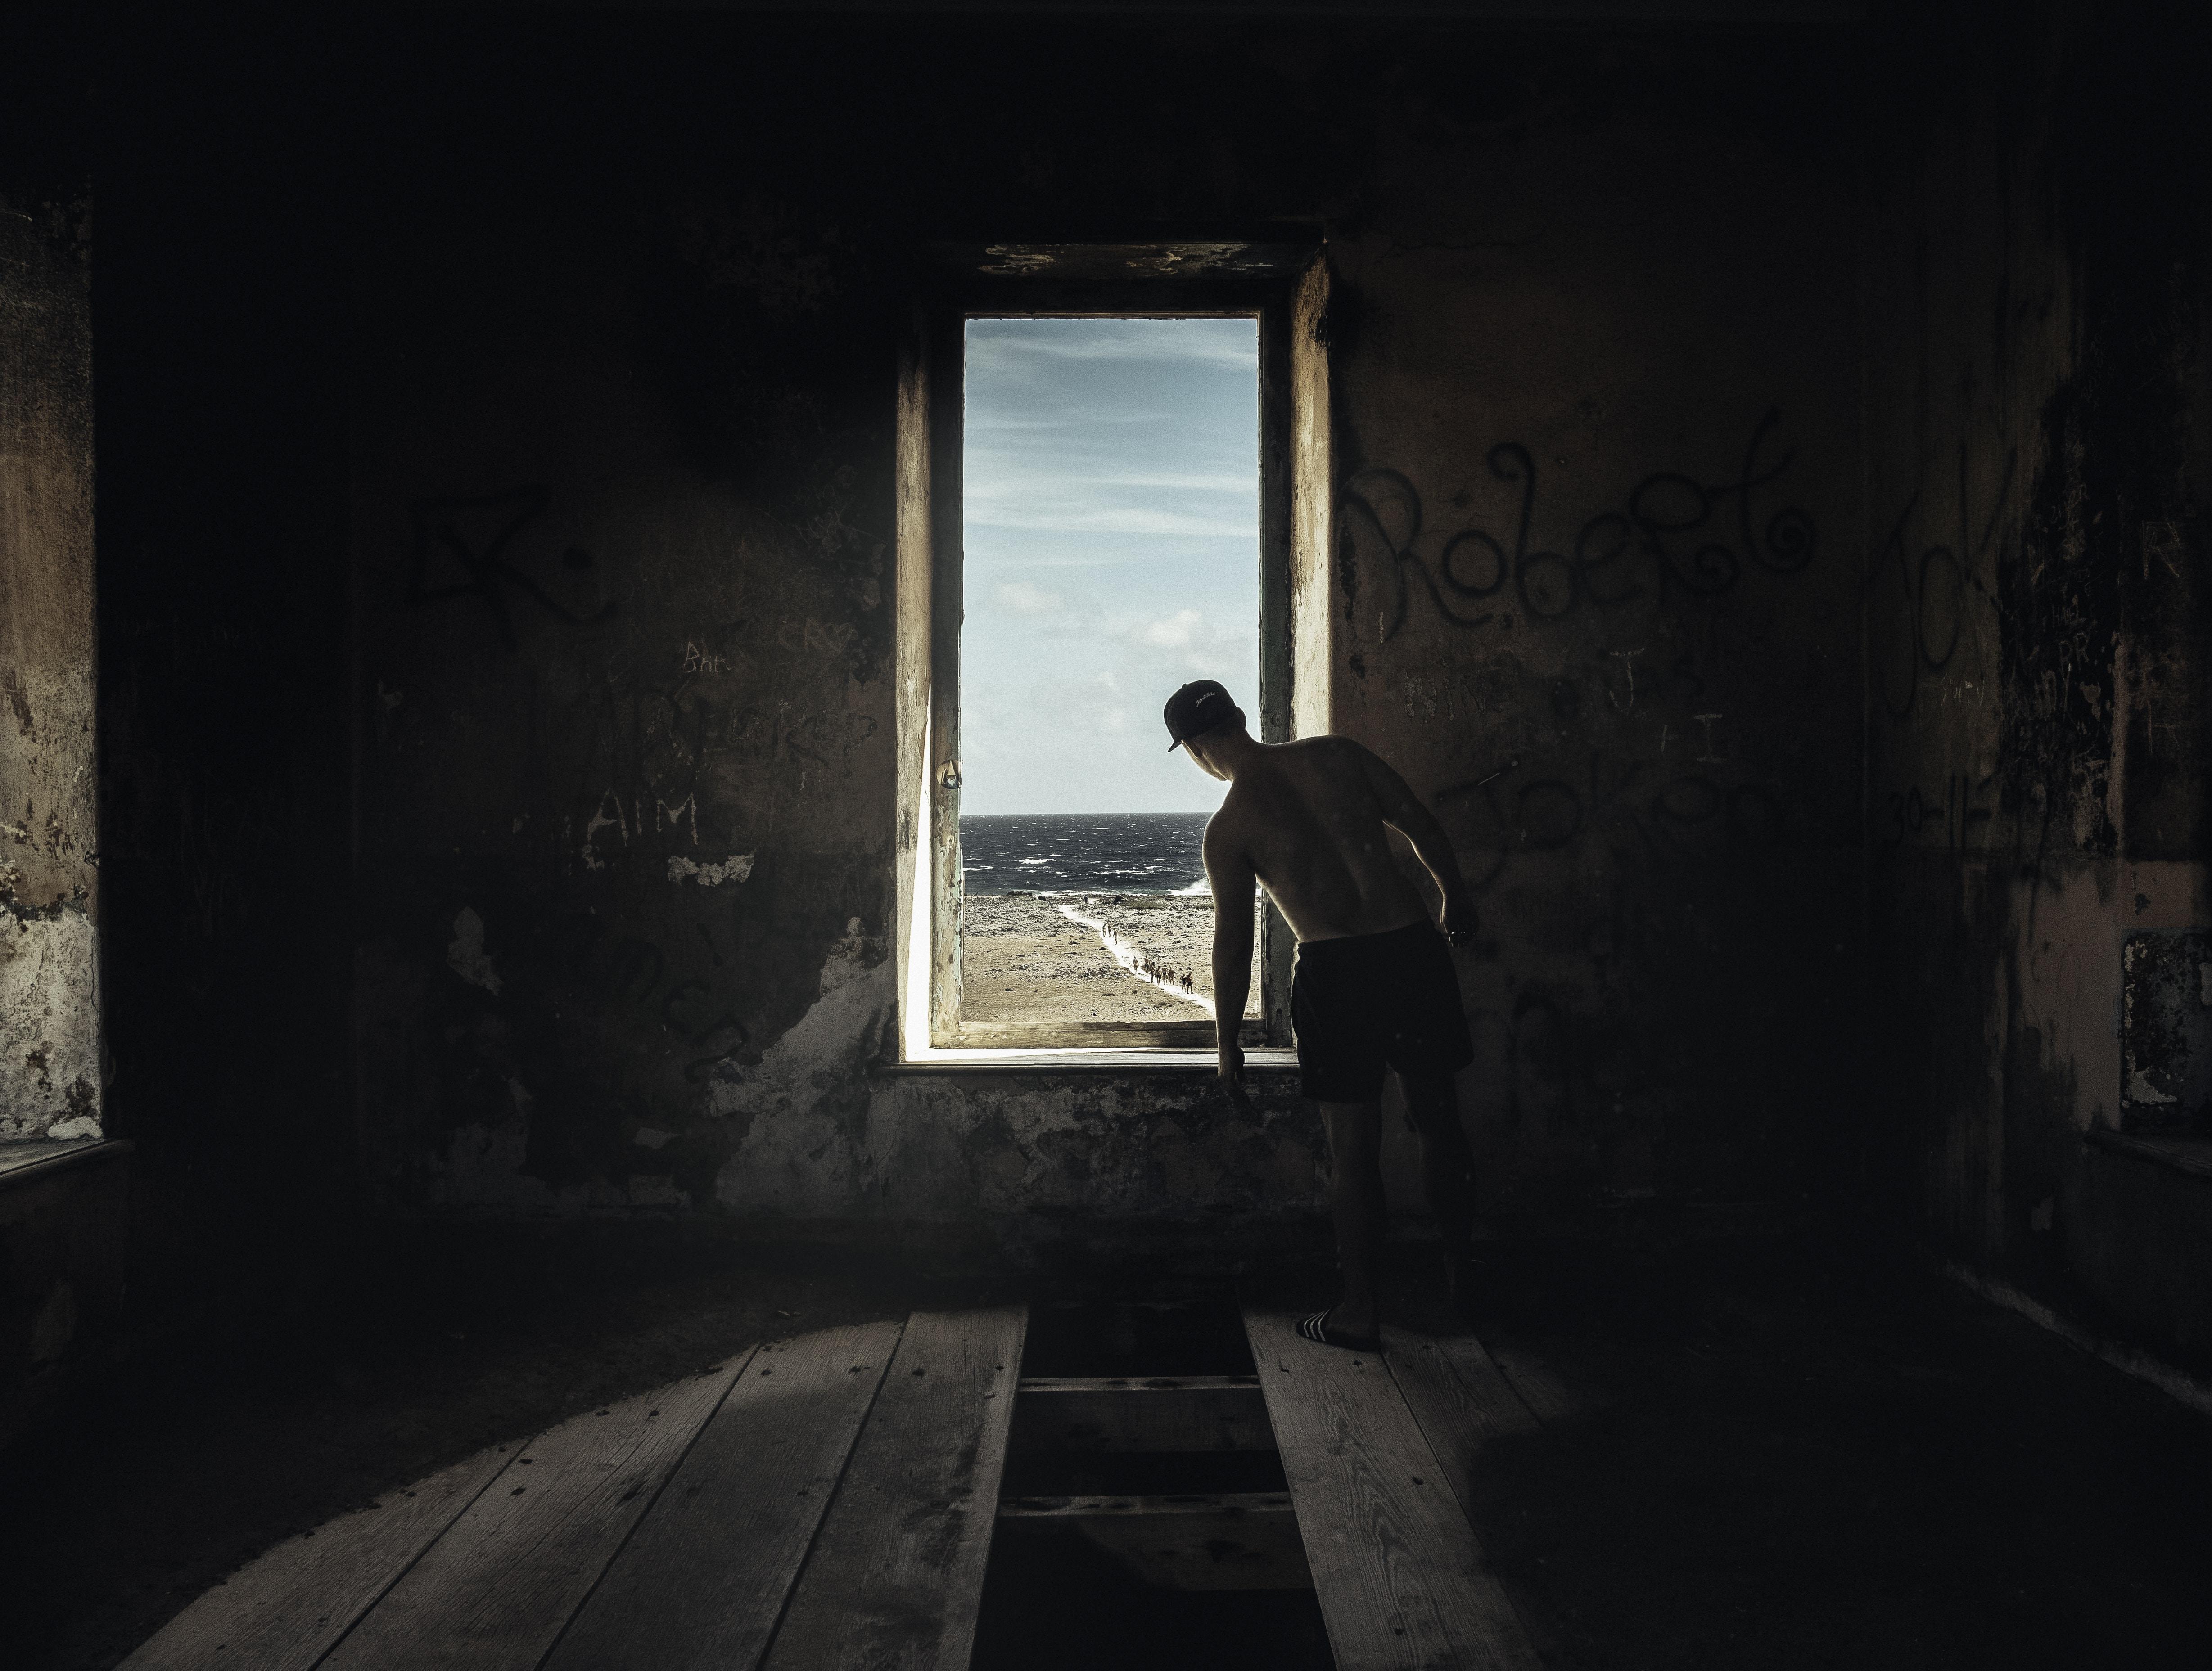 man peeping on window